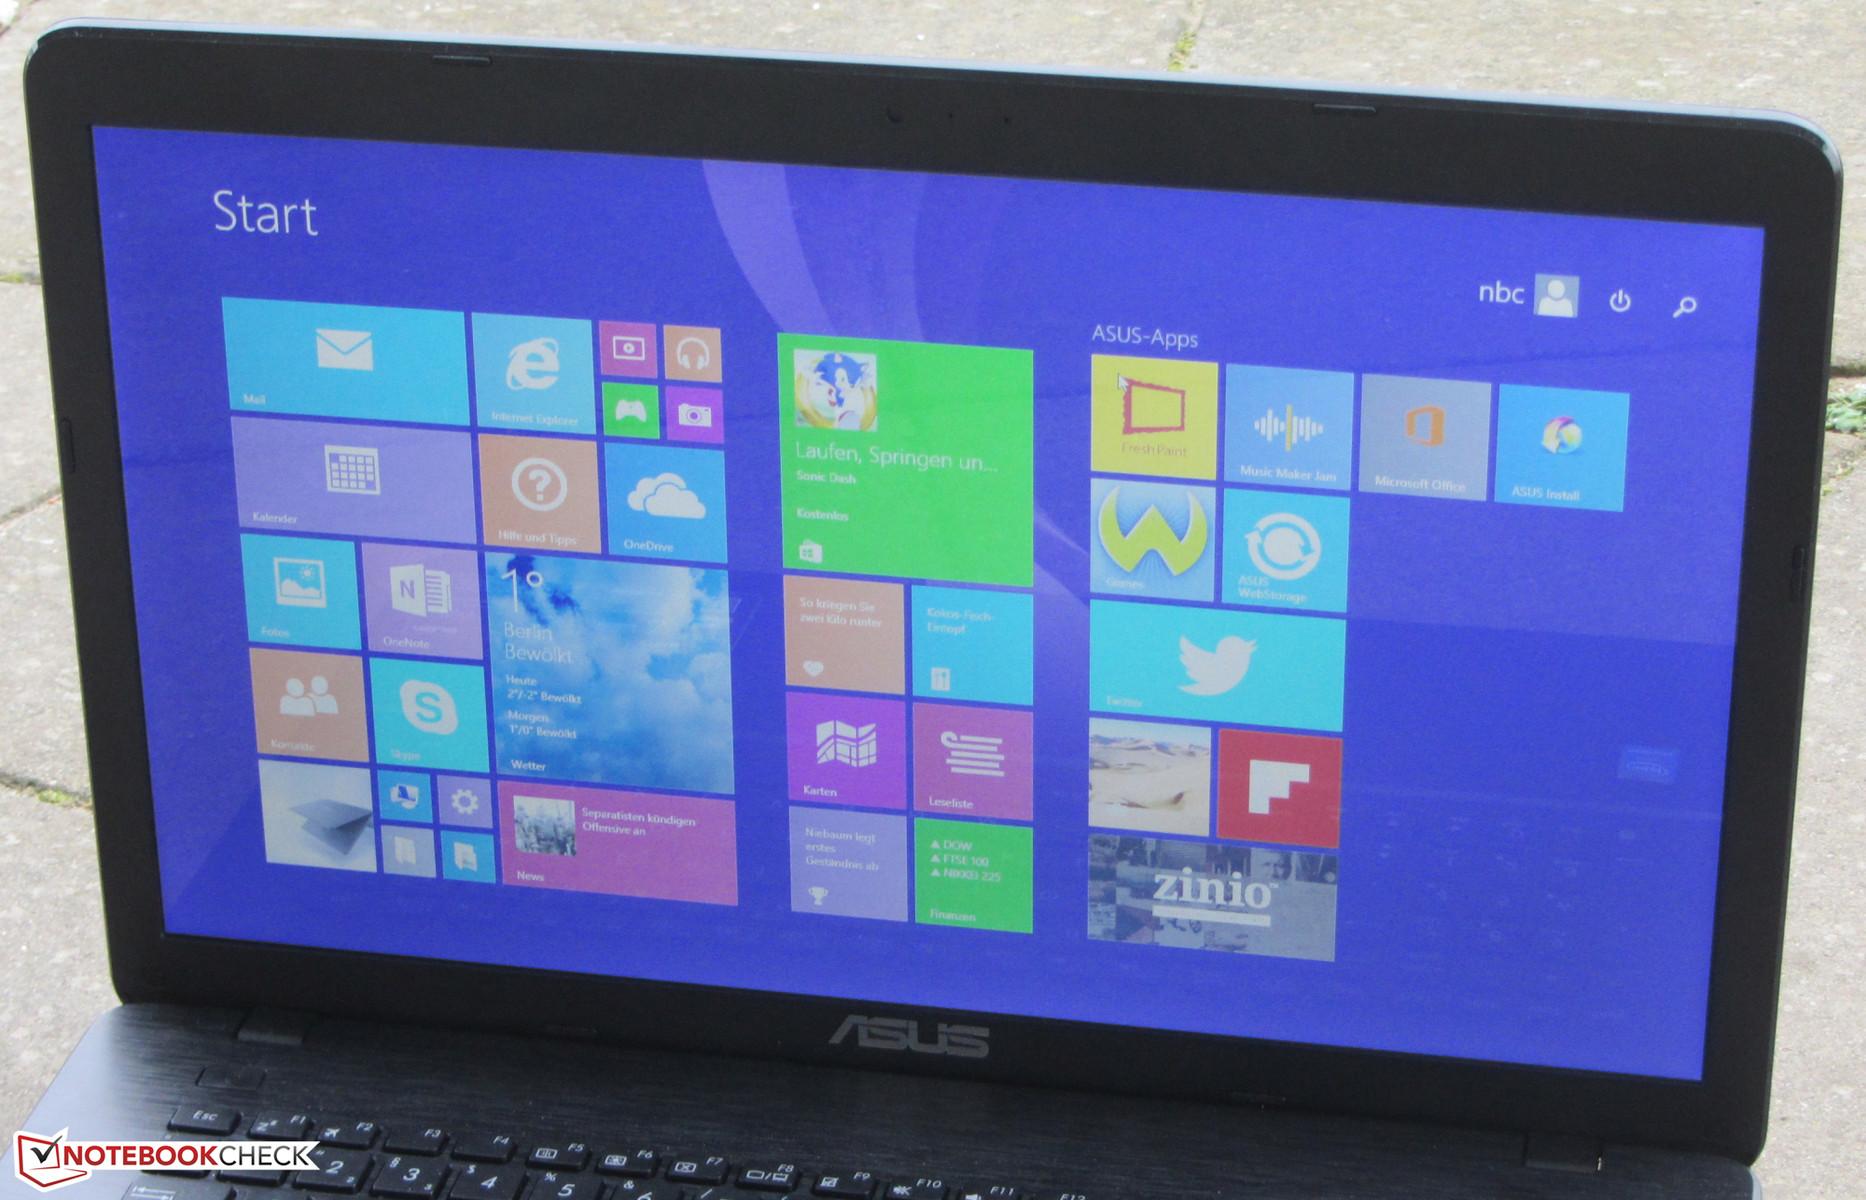 ASUS X751MA Broadcom WLAN Windows 8 X64 Driver Download